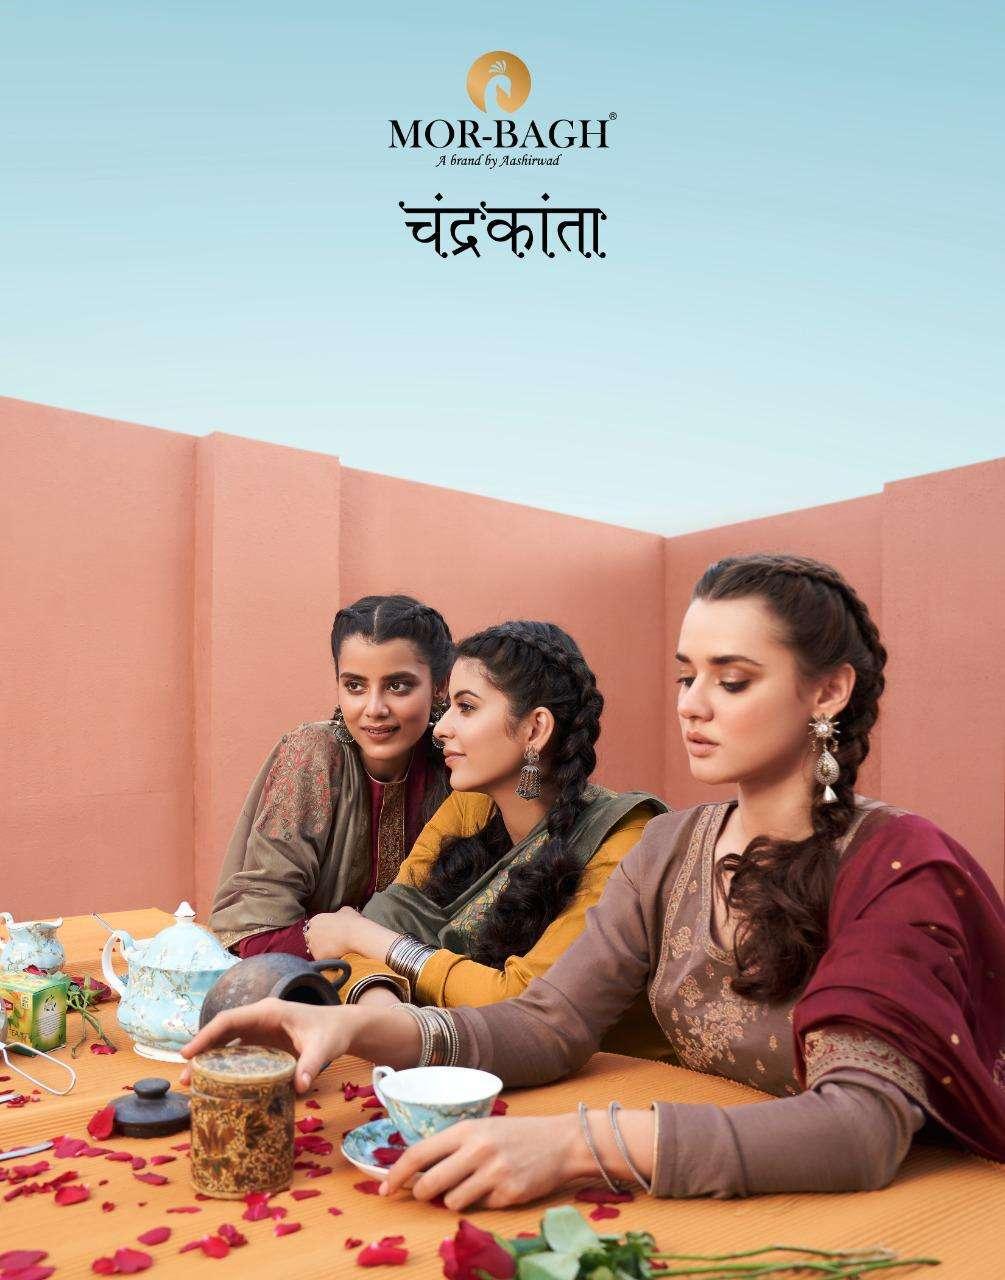 Aashirwad Mor Bagh Chandrakanta Silk Salwar Suit Catalogs at Best price